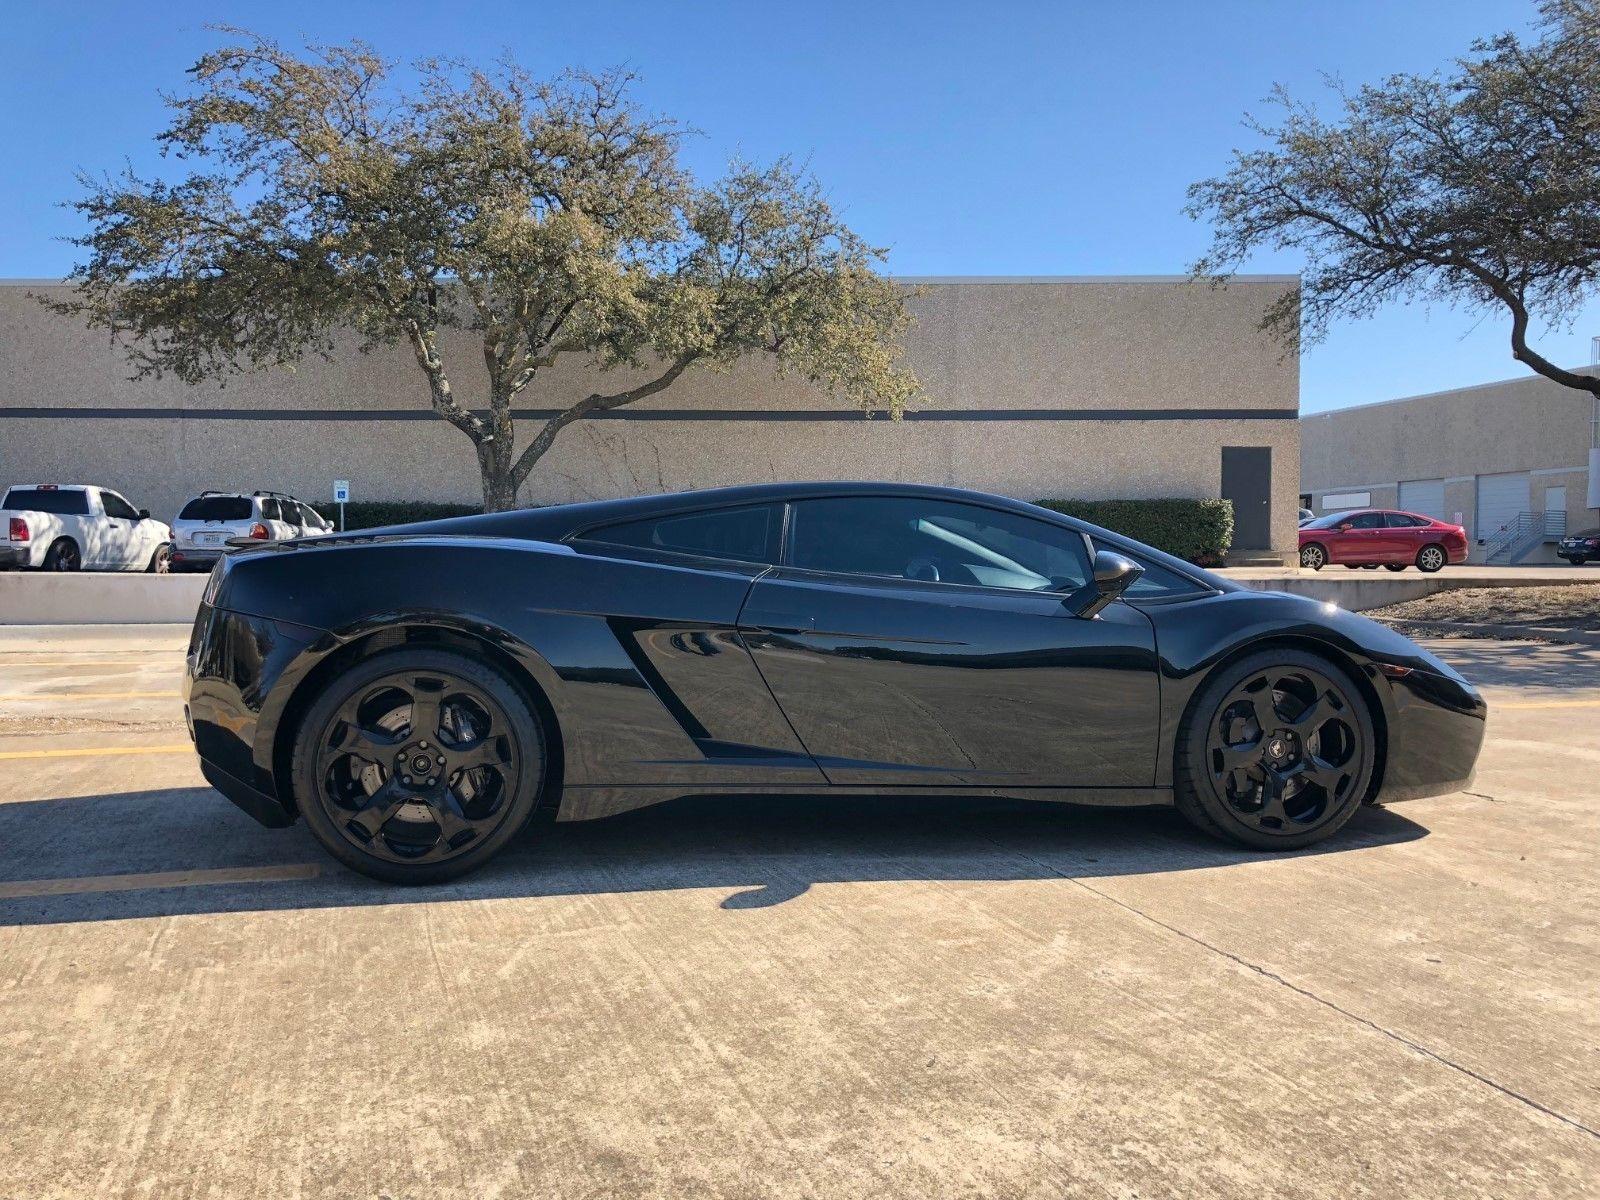 Amazing 2004 Lamborghini Gallardo 2004 Lamborghini Gallardo 6 Speed Heffner Twin Turbo Kit And Manual Trans Tt 2017 2018